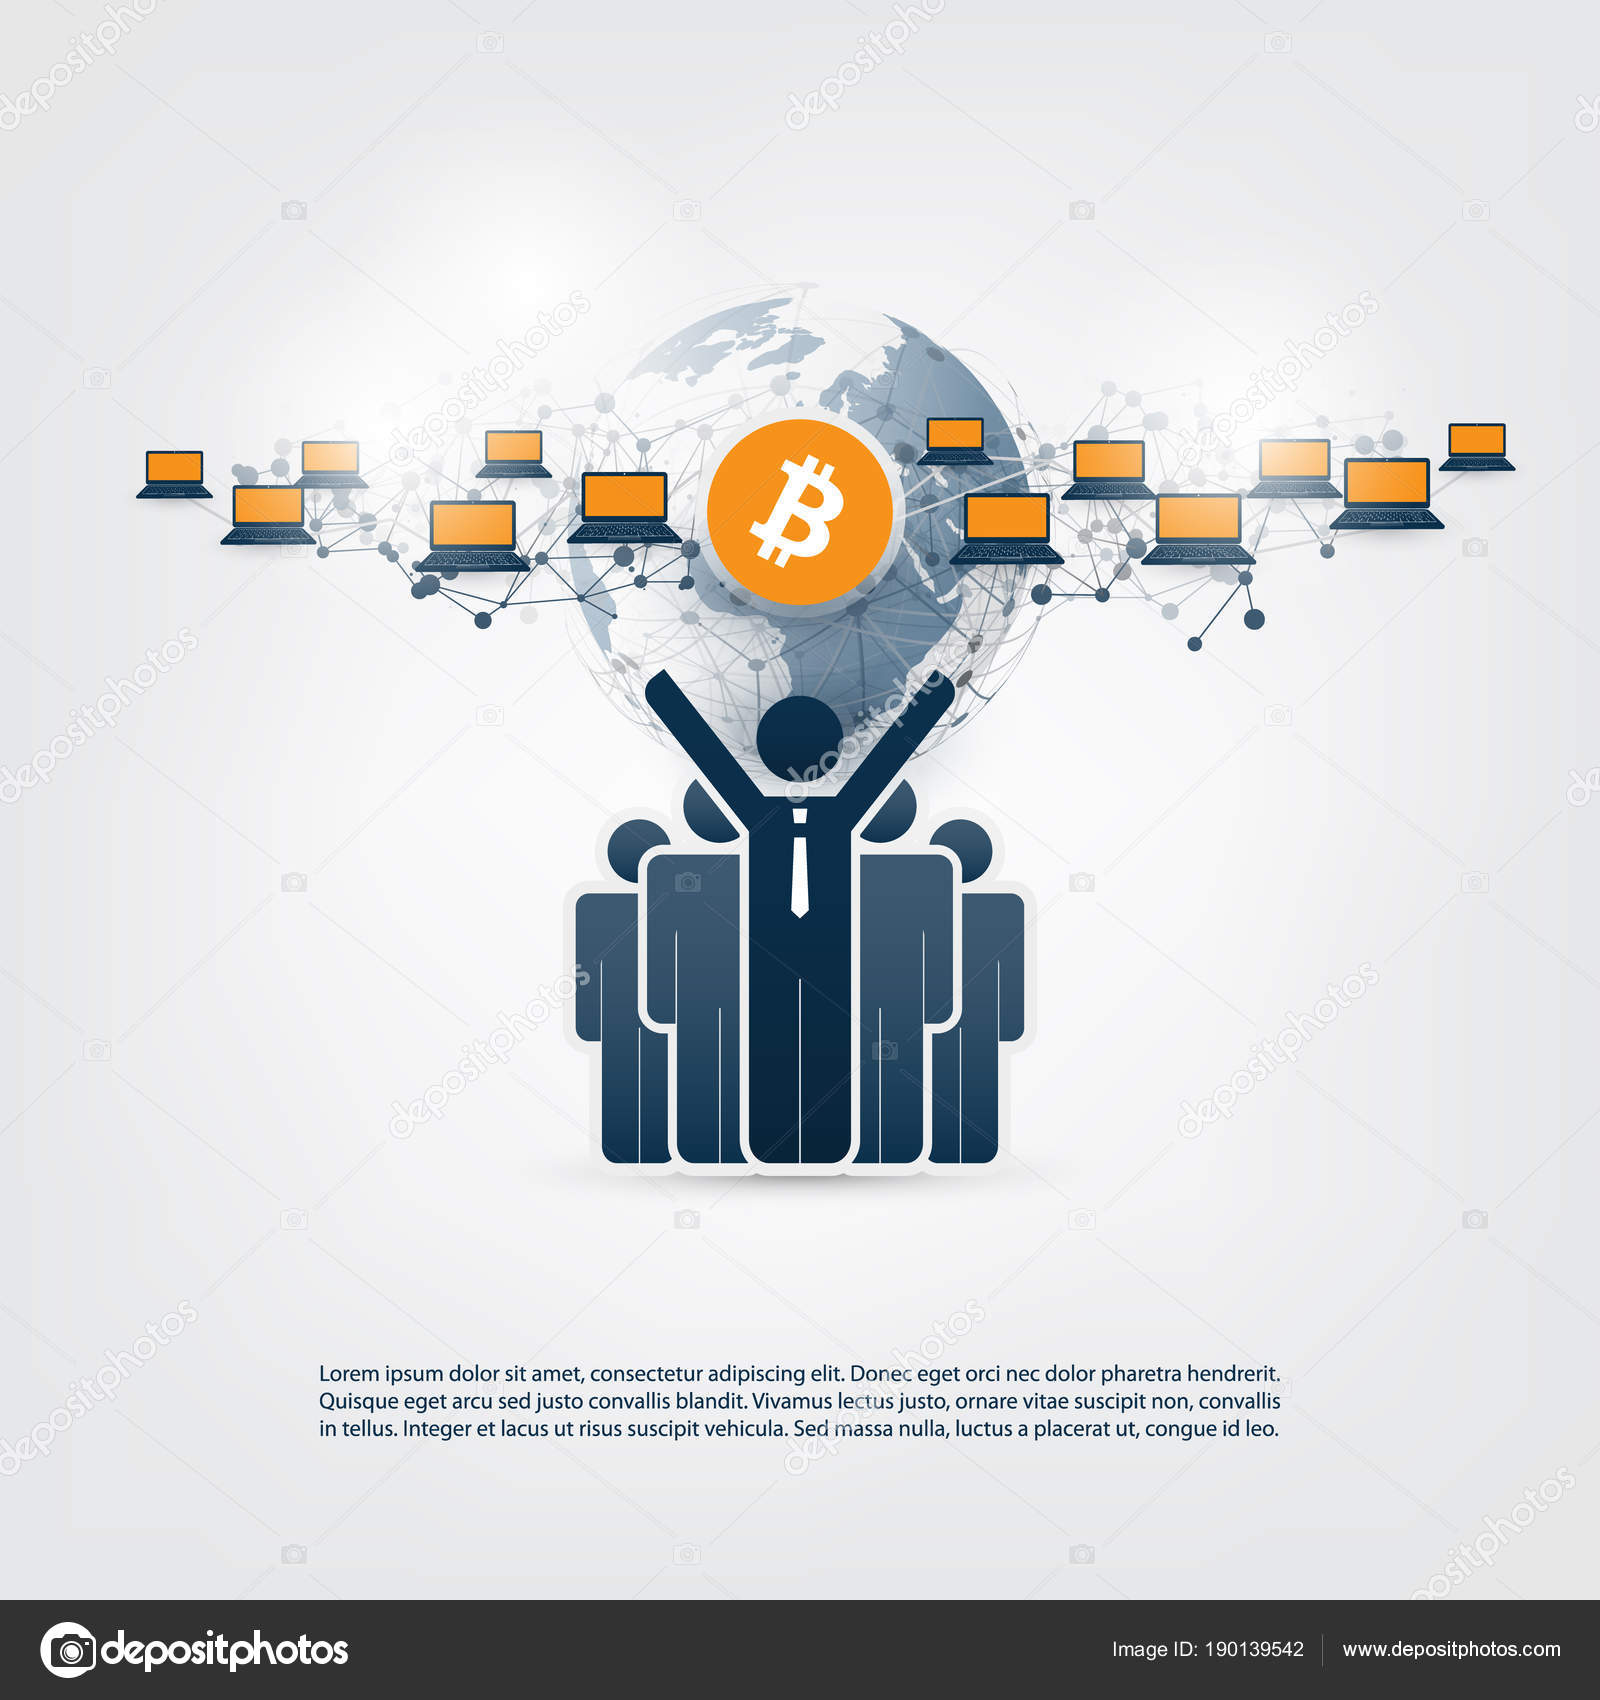 blitz mining cryptocurrency